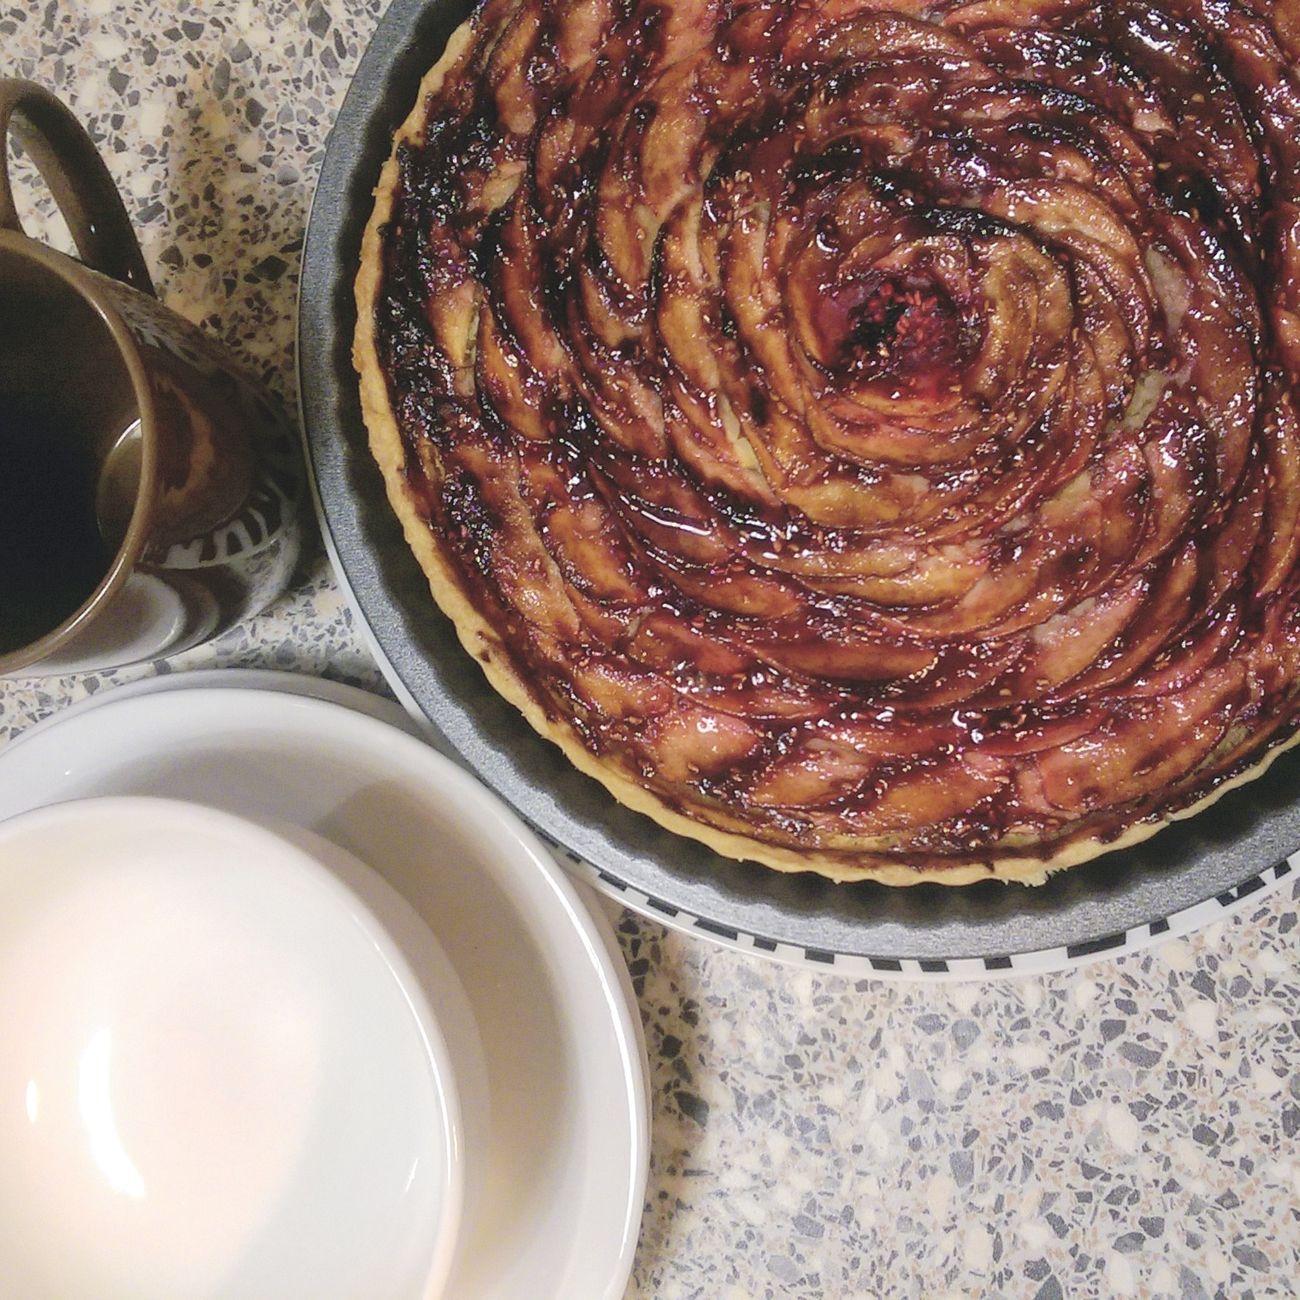 Fresh Fruit Baking Apple Pie Apple Tarte Apple Tart Apples Food Food Photography Food And Drink Sweet